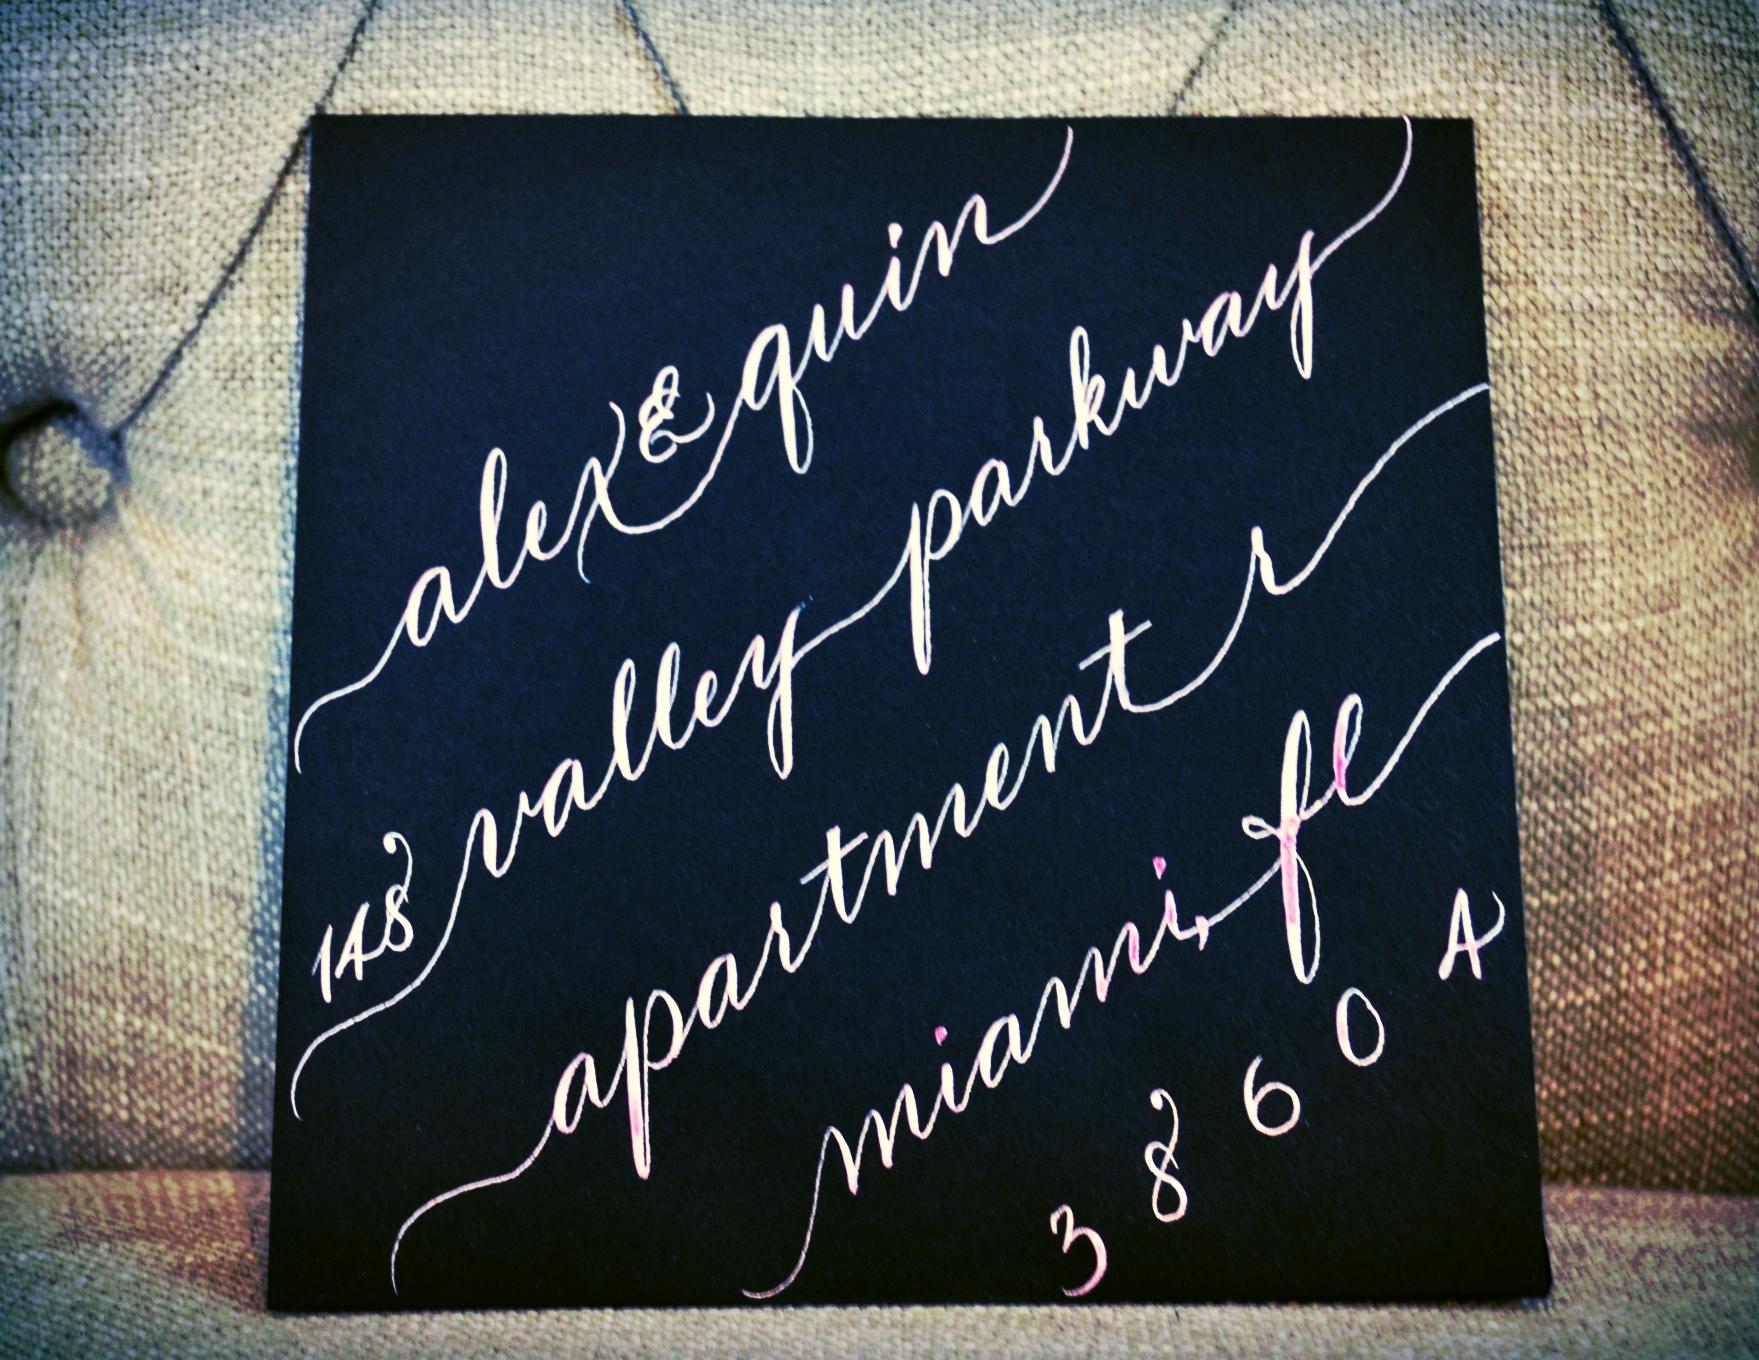 Houston Calligraphy - Perspective 3.jpg